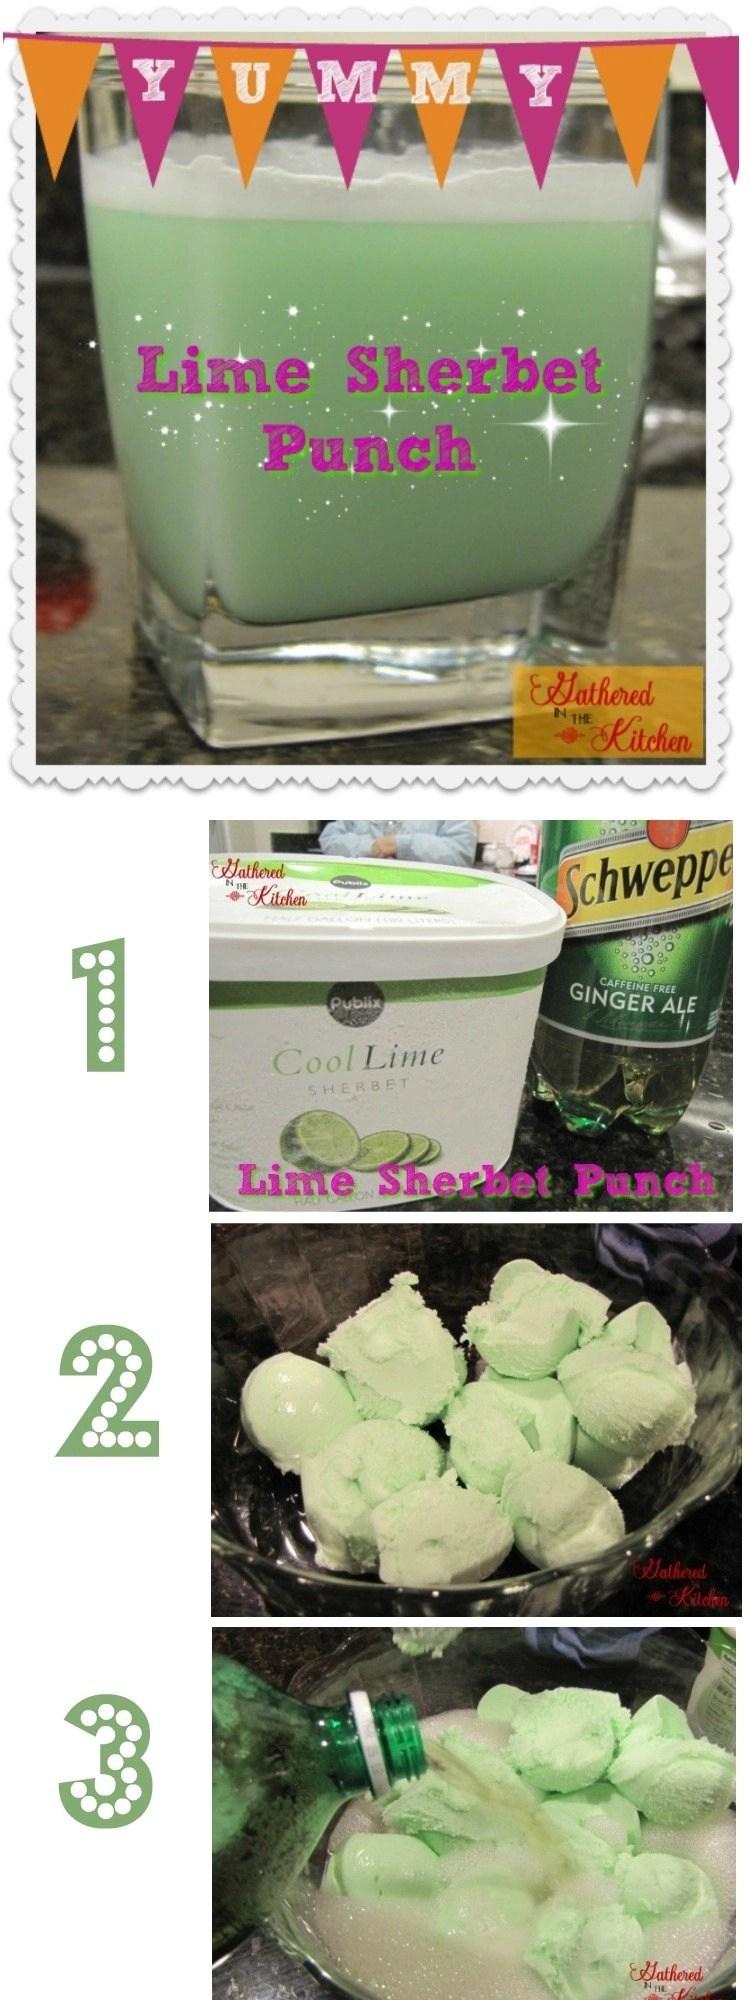 lime-sherbet-punch